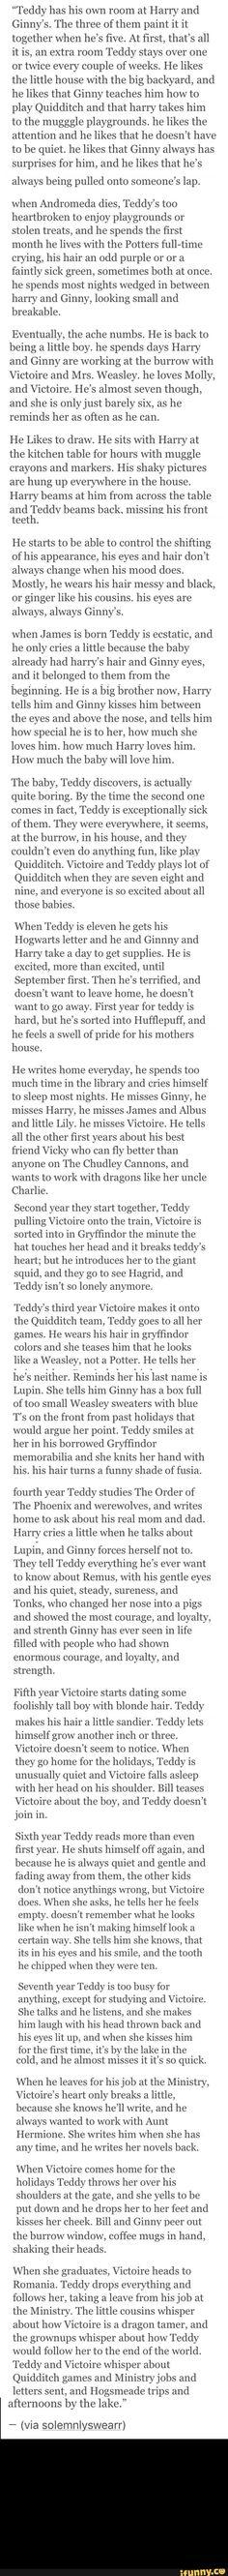 Aww my heart. Teddy Lupin